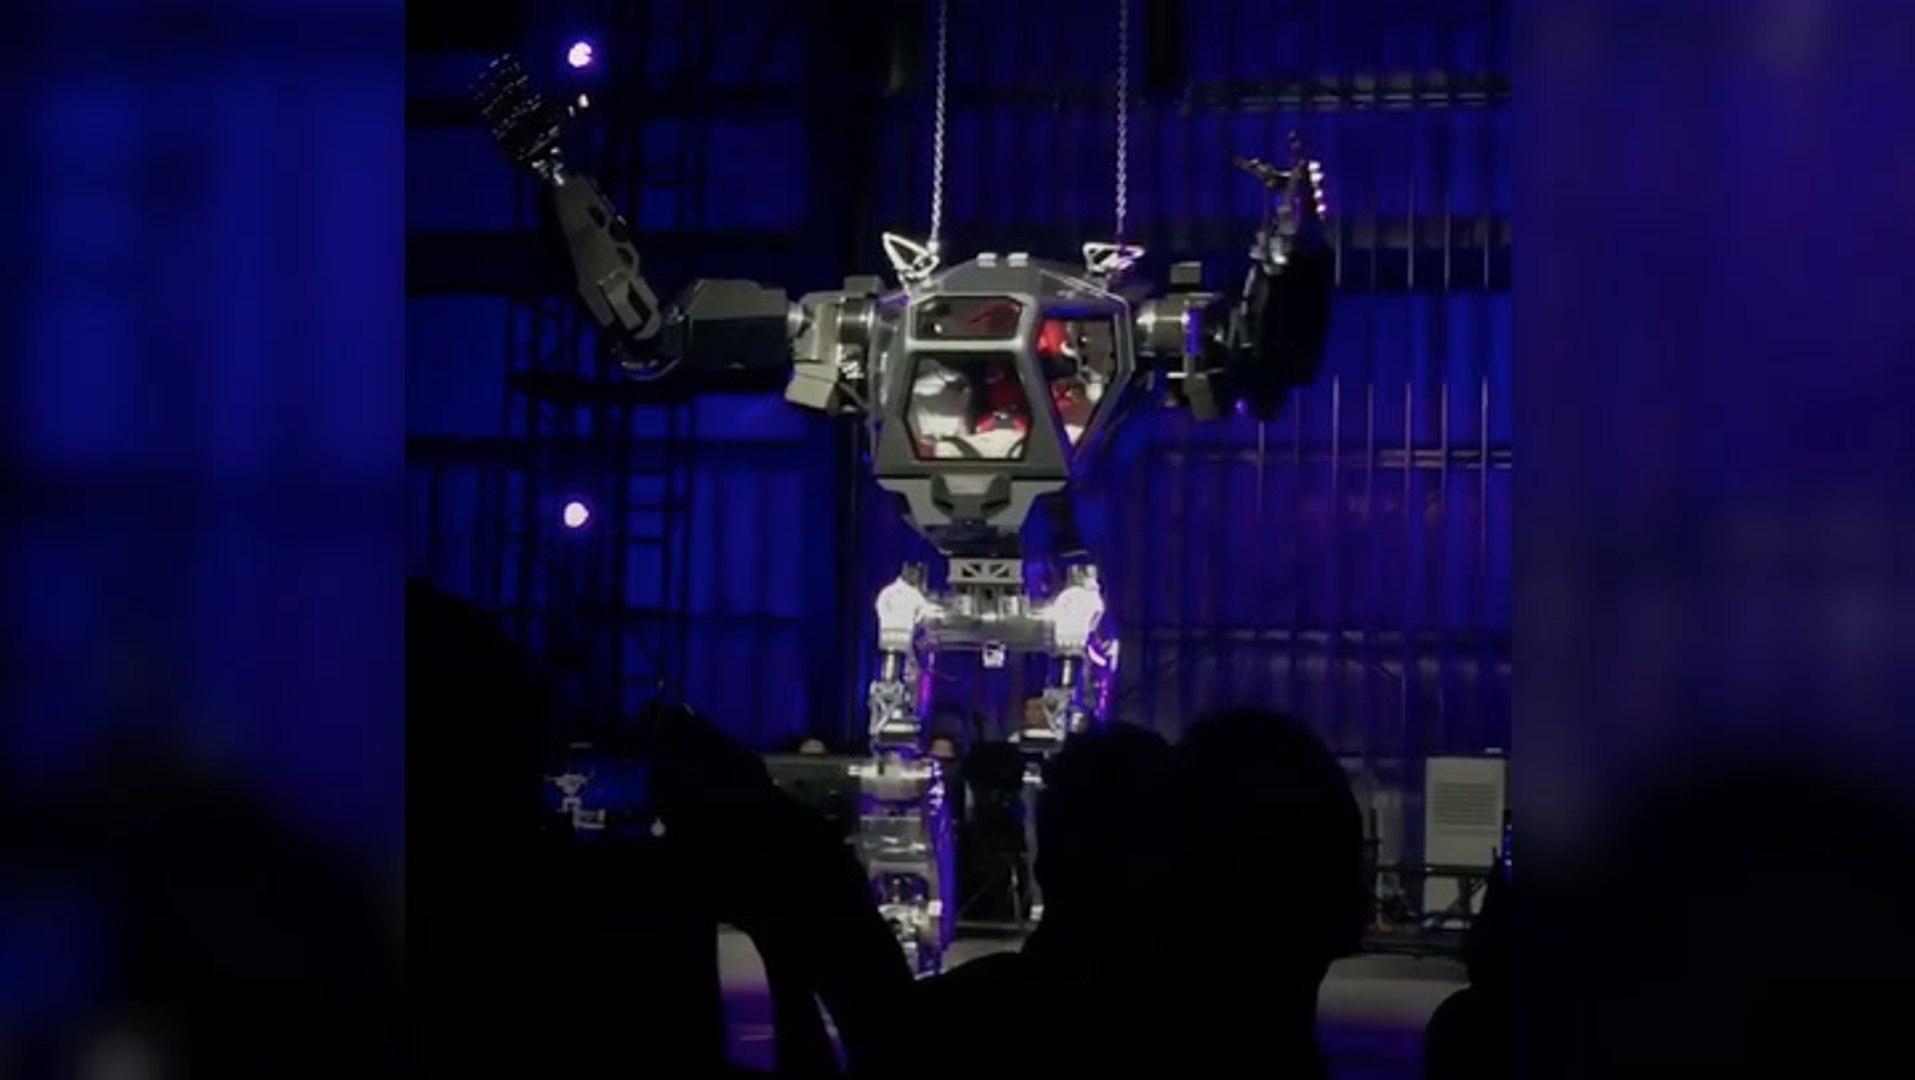 Amazon CEO Jeff Bezos becomes Bezosbot and it's pretty epic